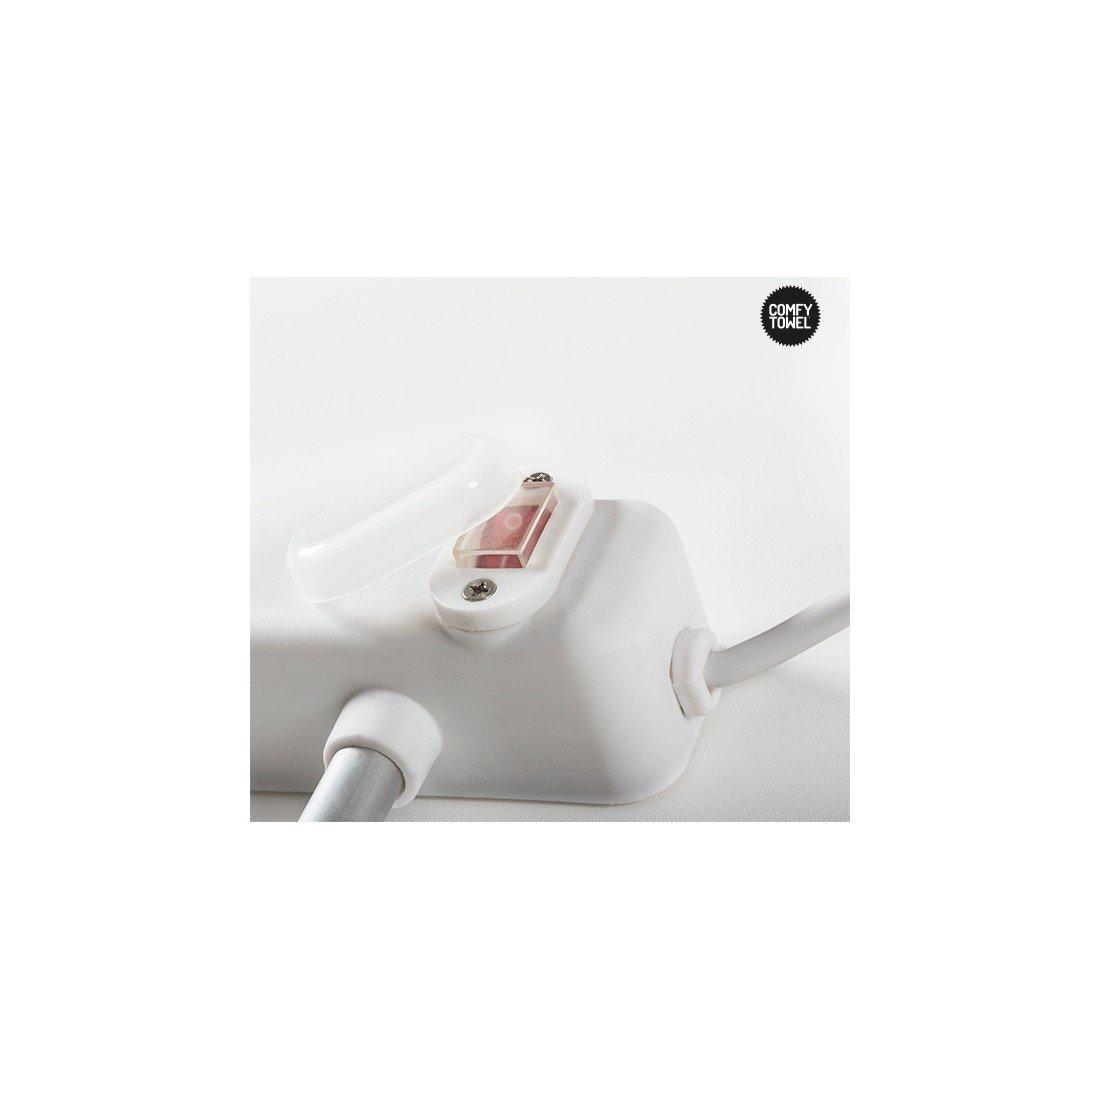 Scaldasalviette Elettrico Da Muro Comfy Towel